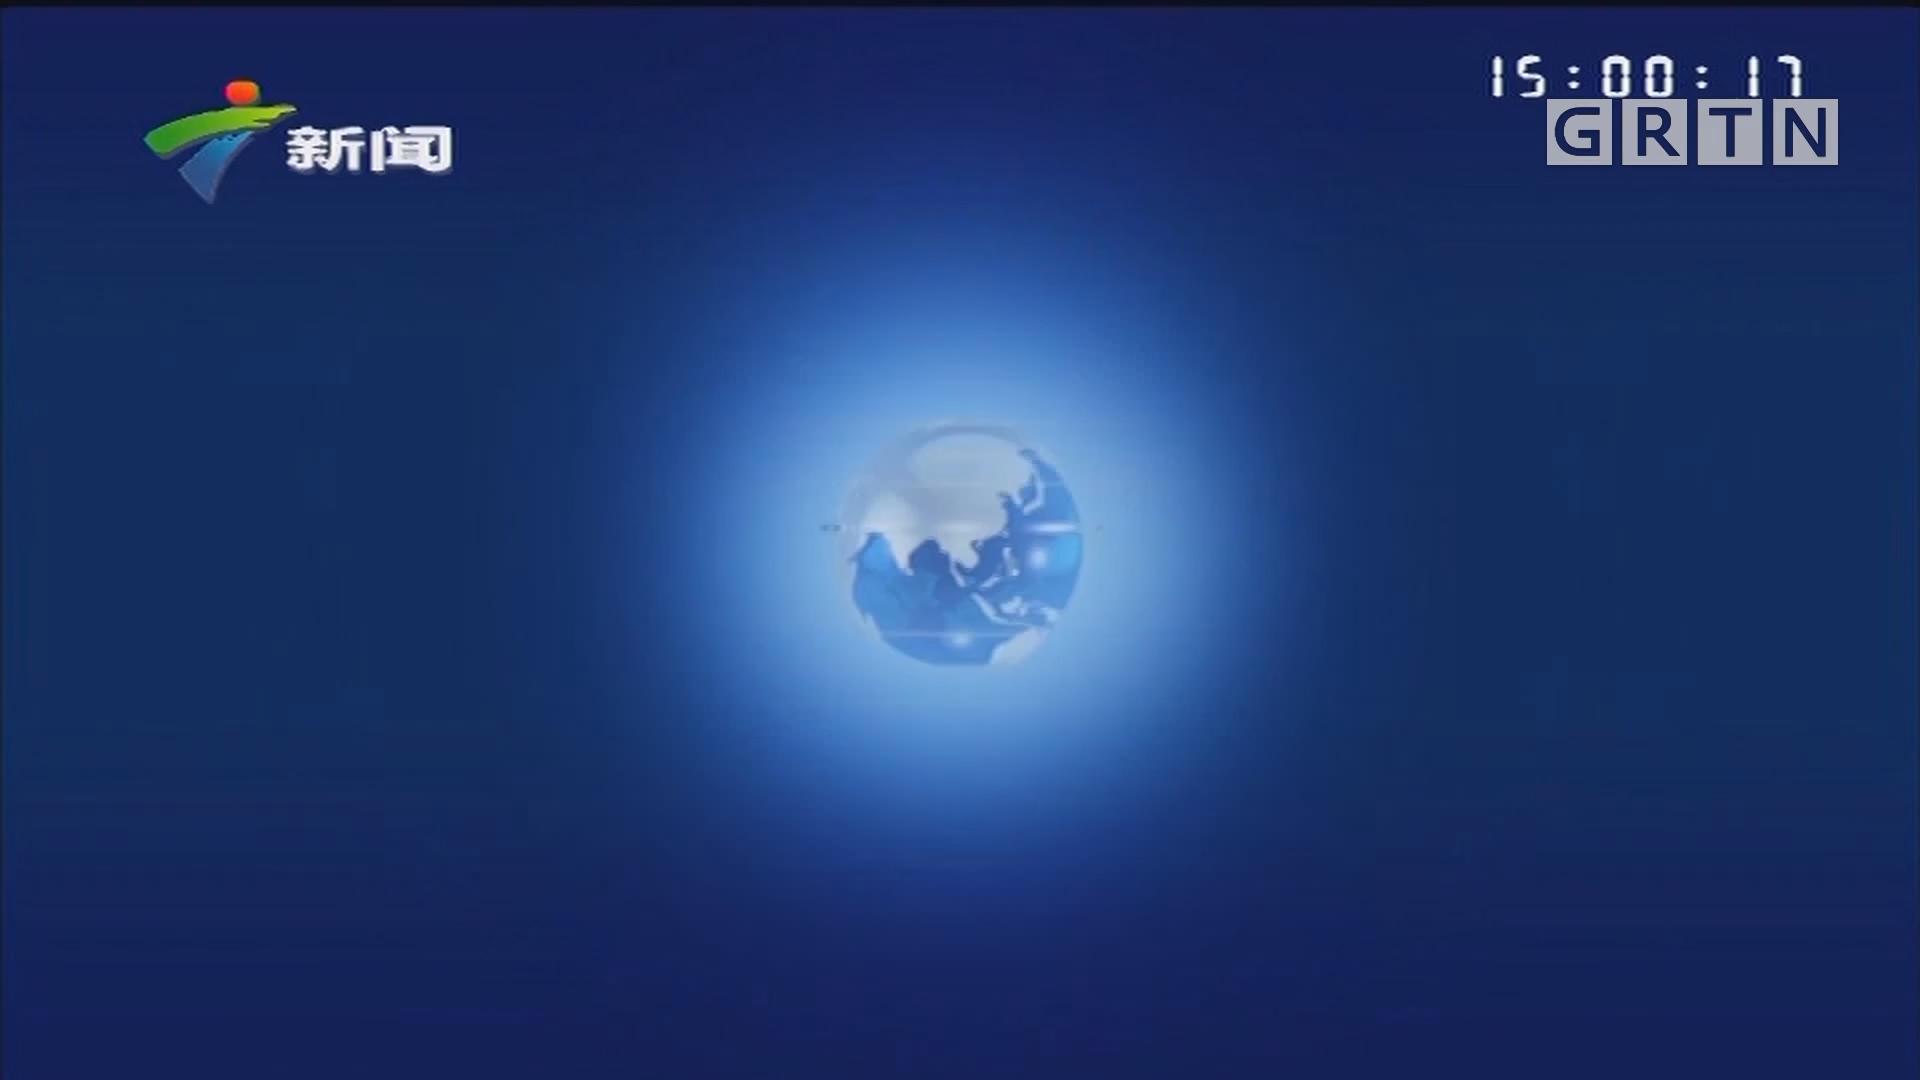 [HD][2019-10-21]正點播報:聚焦2019世界VR產業大會 VR 5G驚艷世界 改變生活